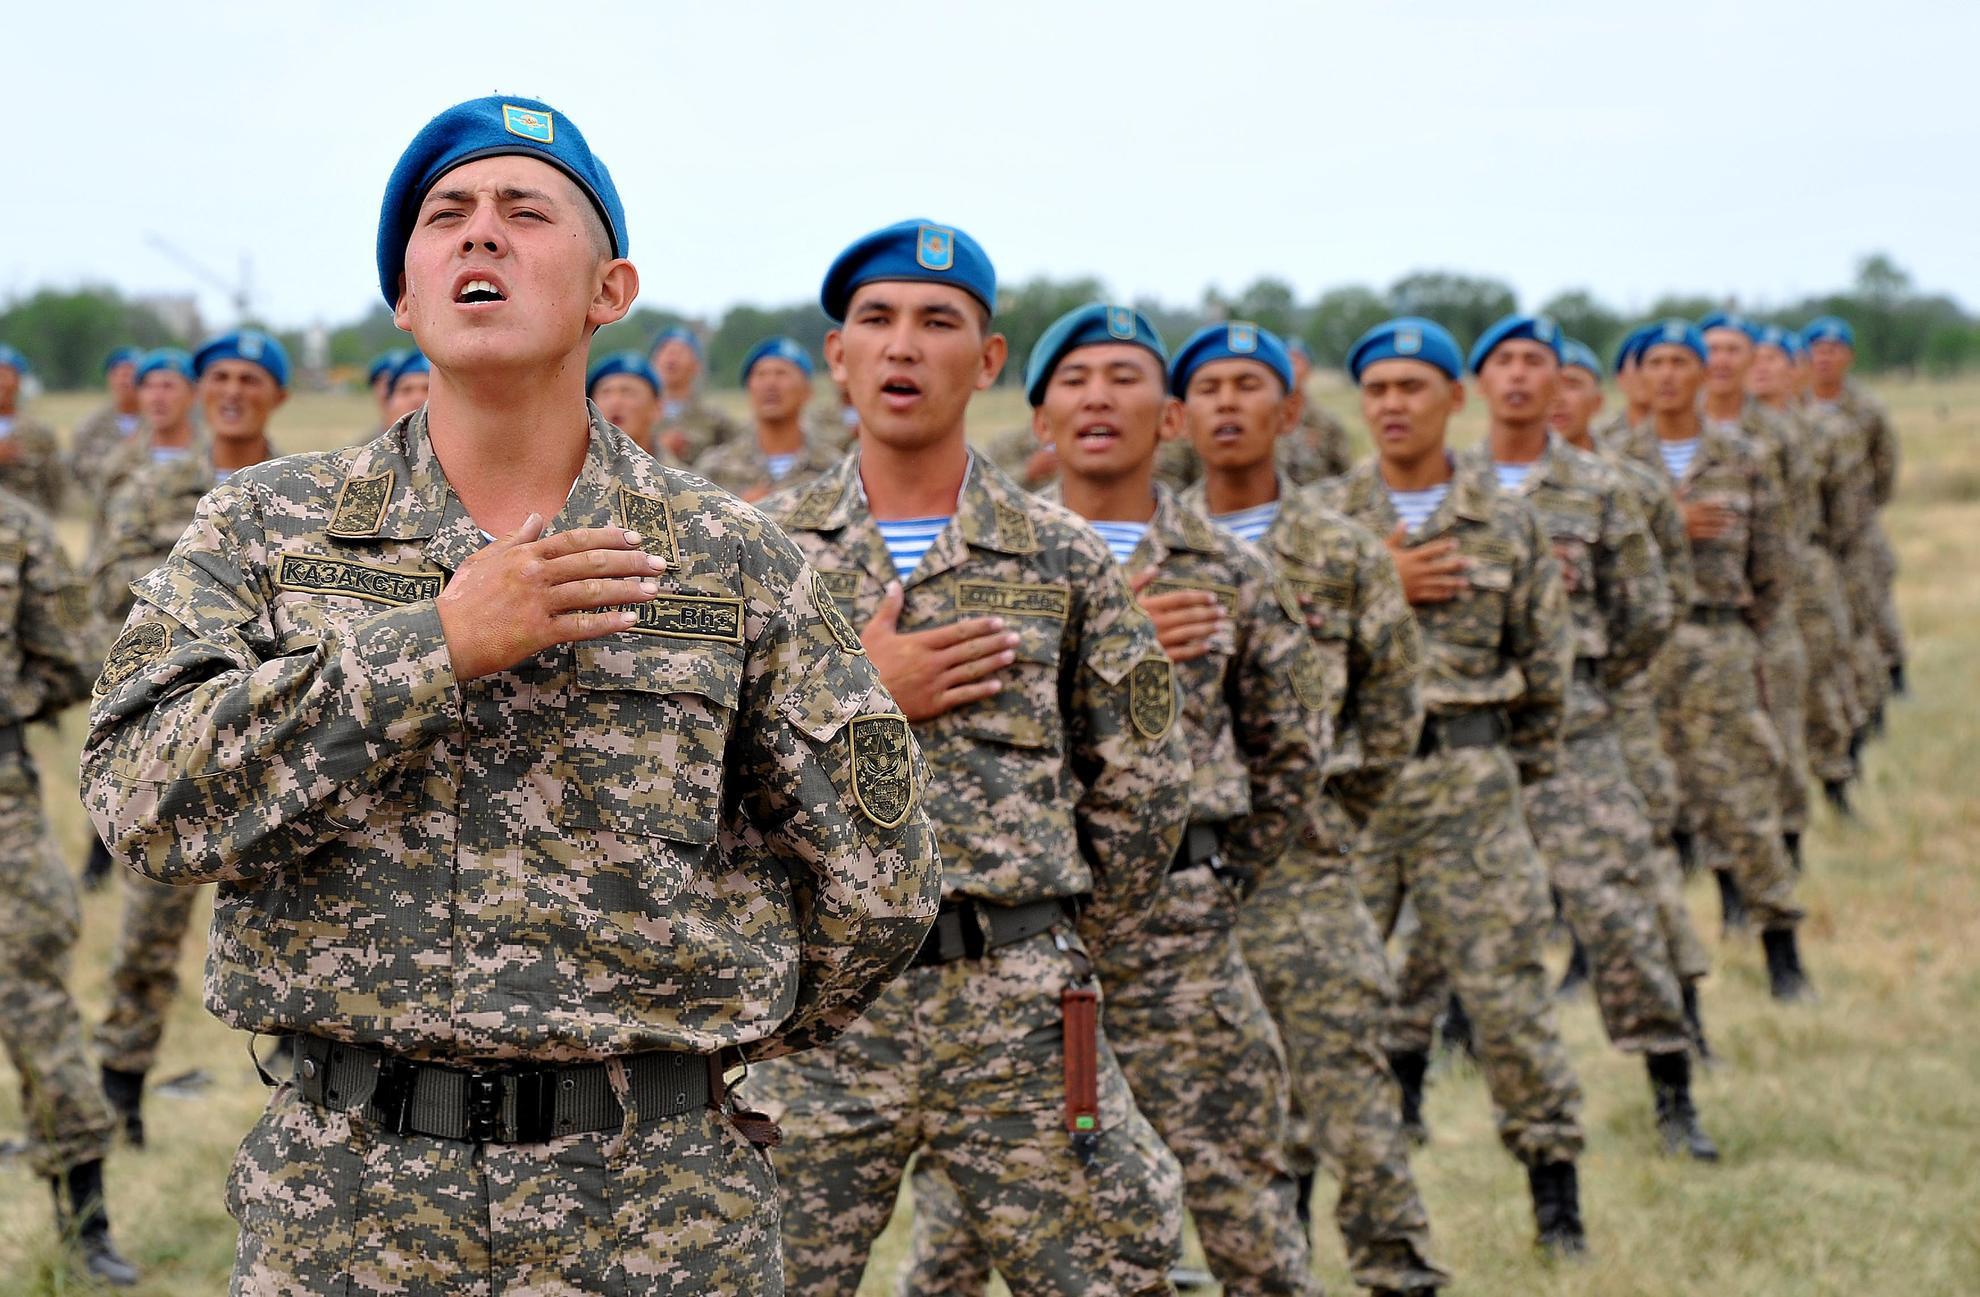 форма десантника фото казахстан